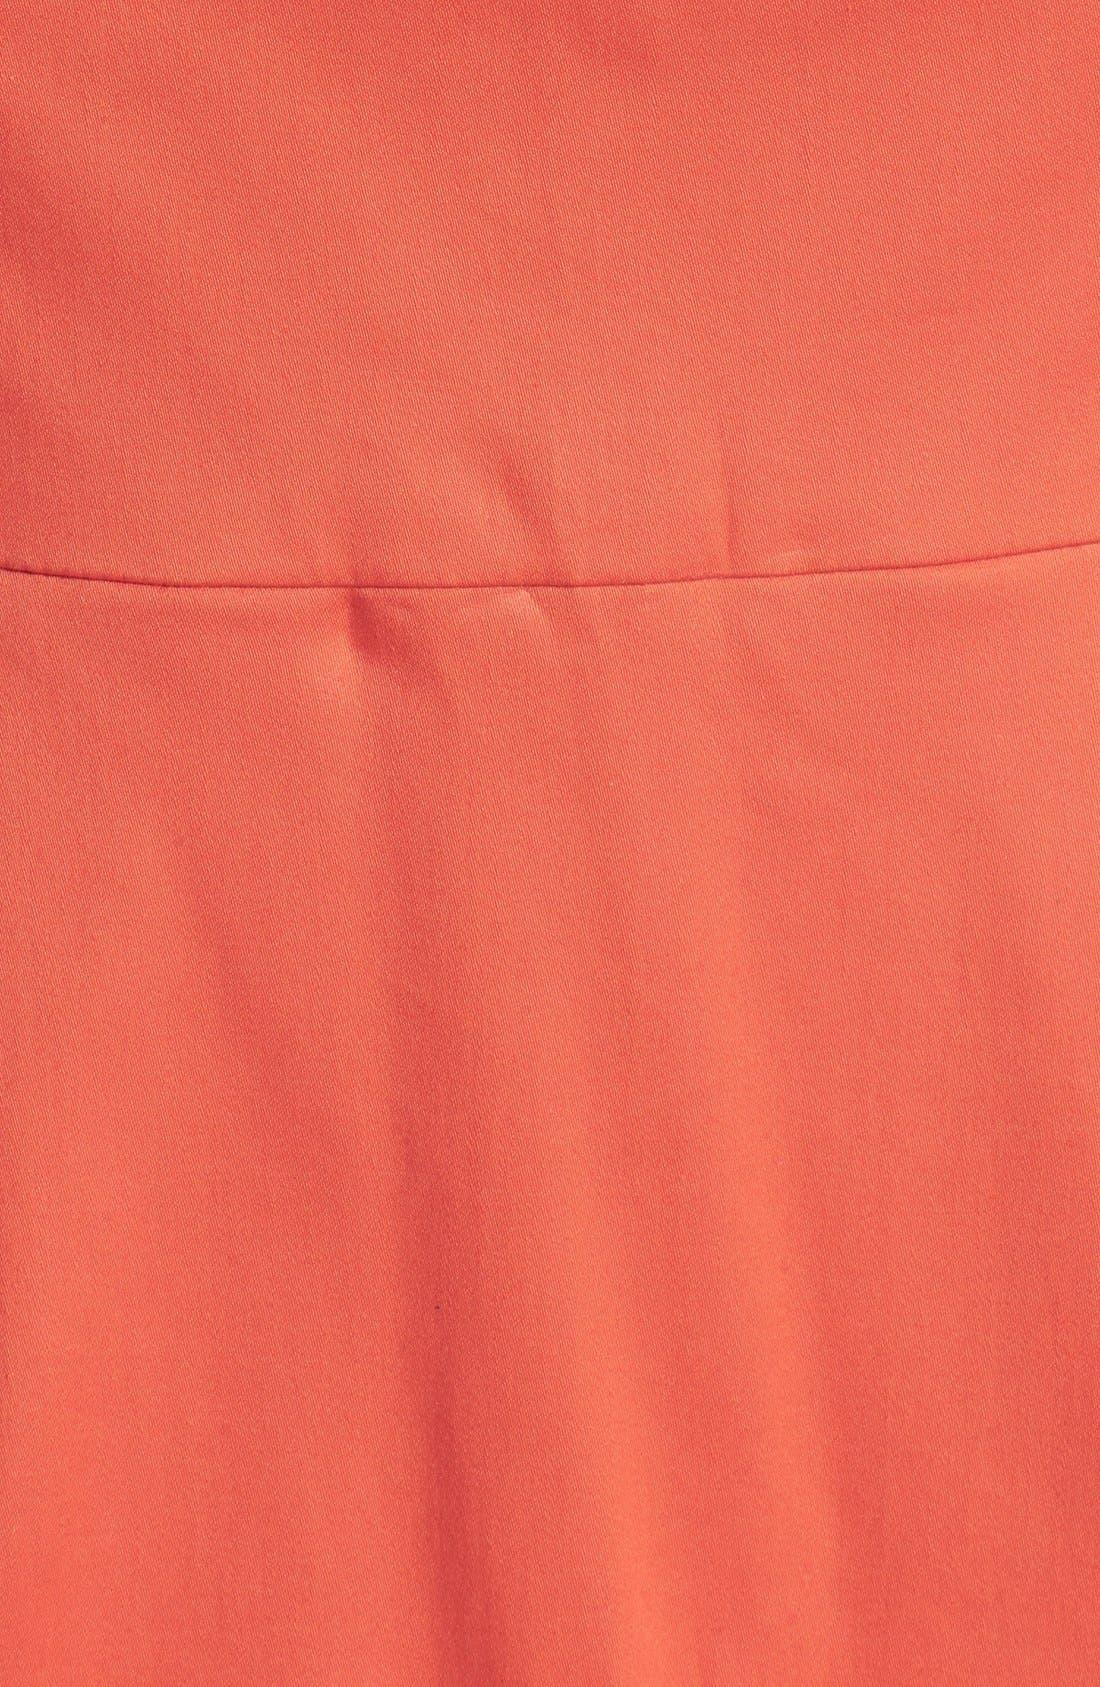 Alternate Image 4  - Adrianna Papell Caged Yoke Stretch Cotton Sheath Dress